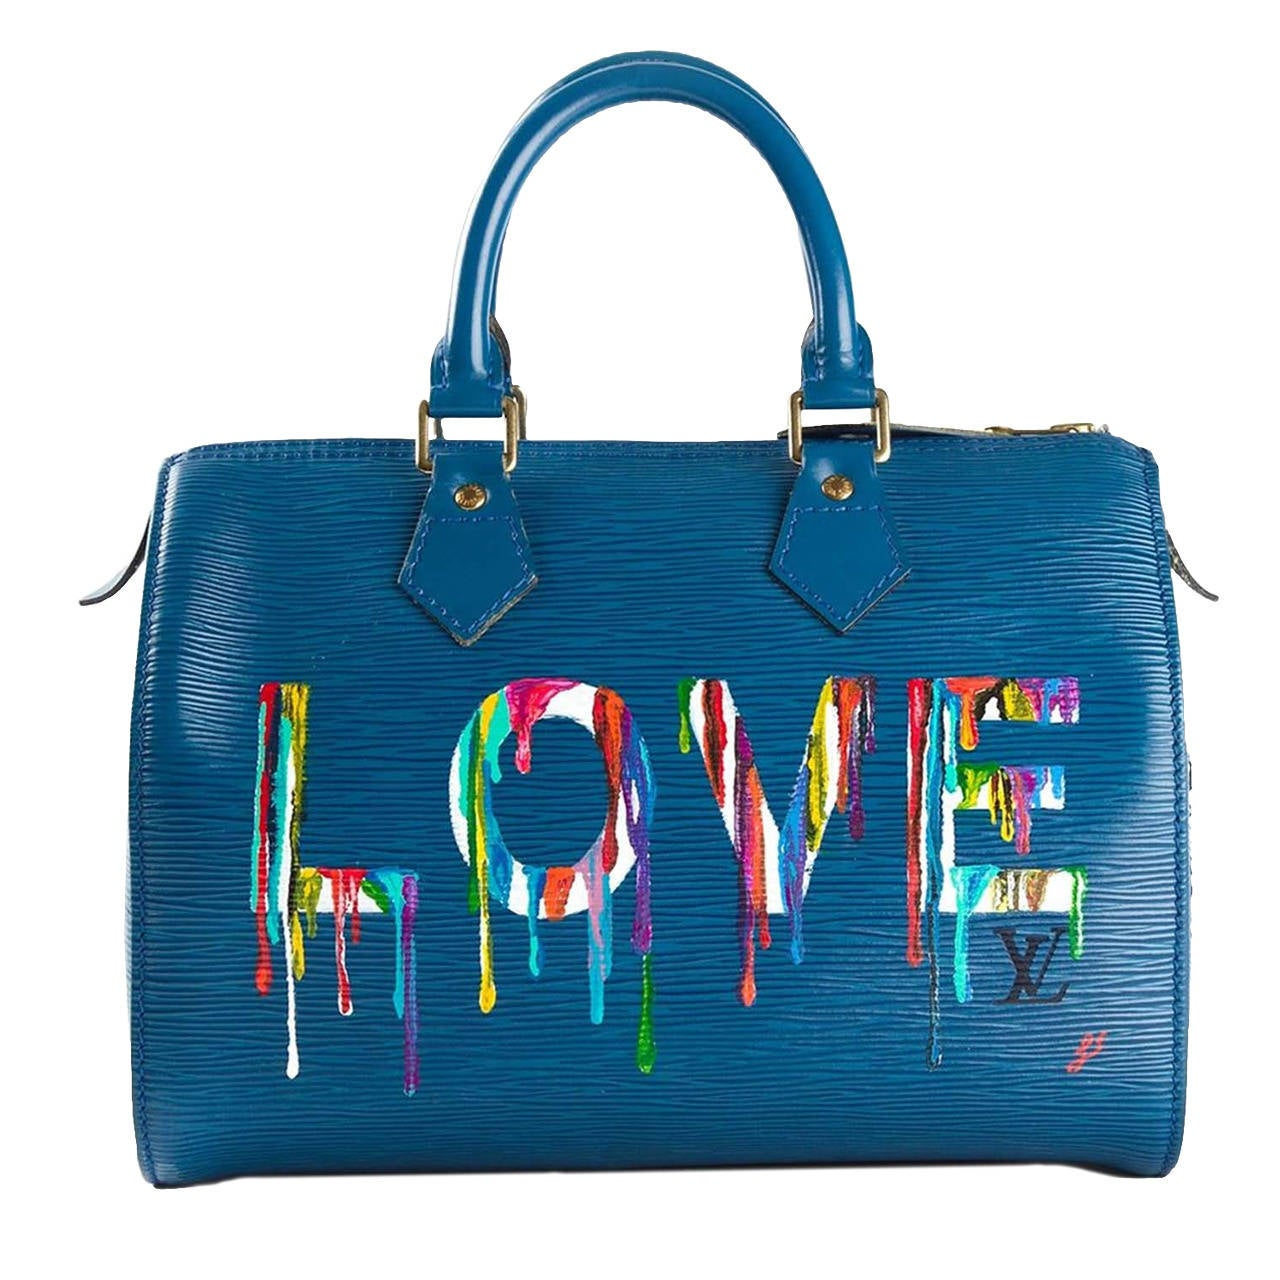 Louis Vuitton Hand Painted Blue Epi Speedy Bag at 1stdibs